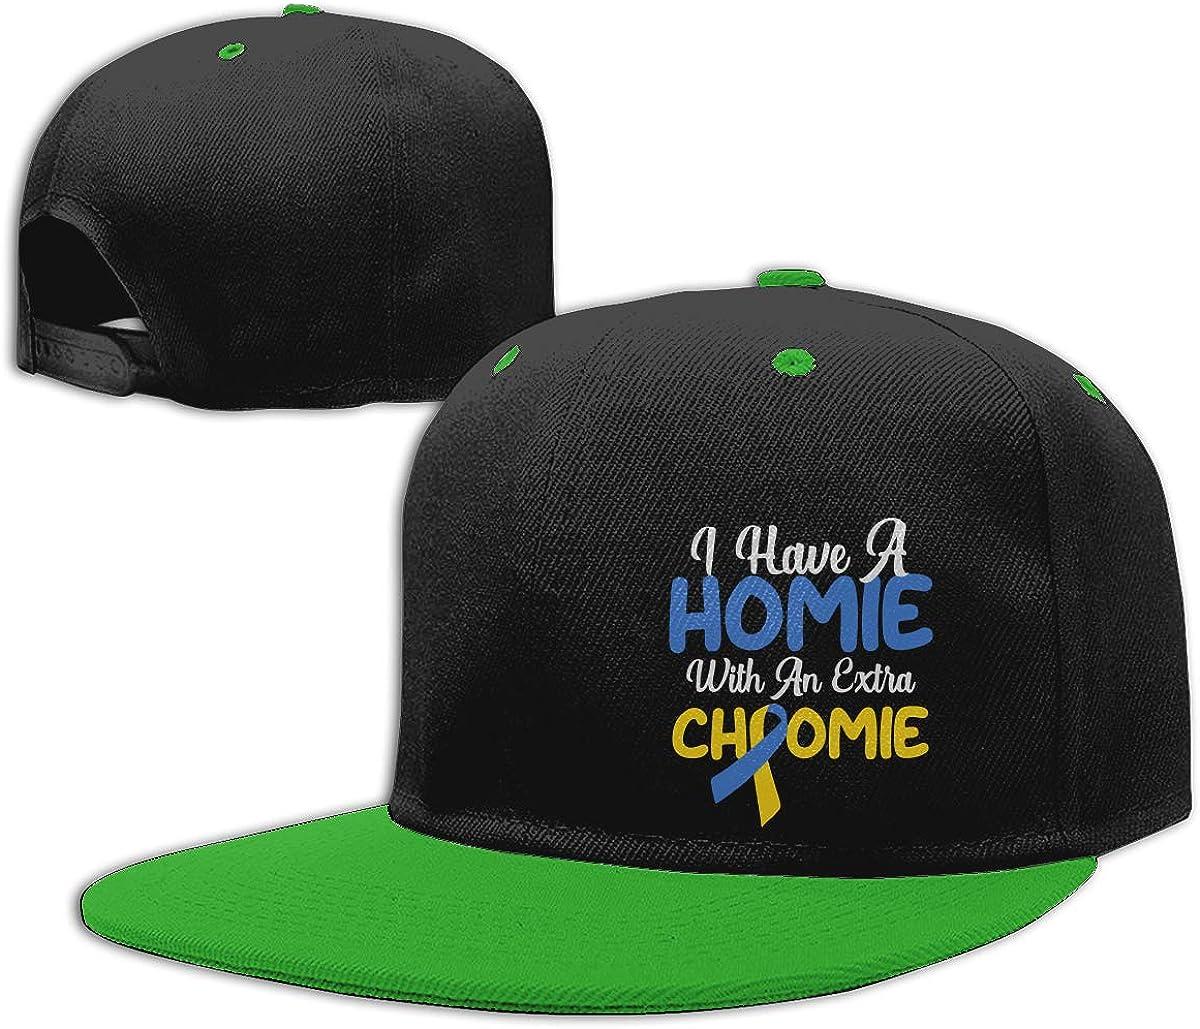 Down Syndrome Unisex Hip Hop Baseball Caps Men Womens Punk Rock Cap